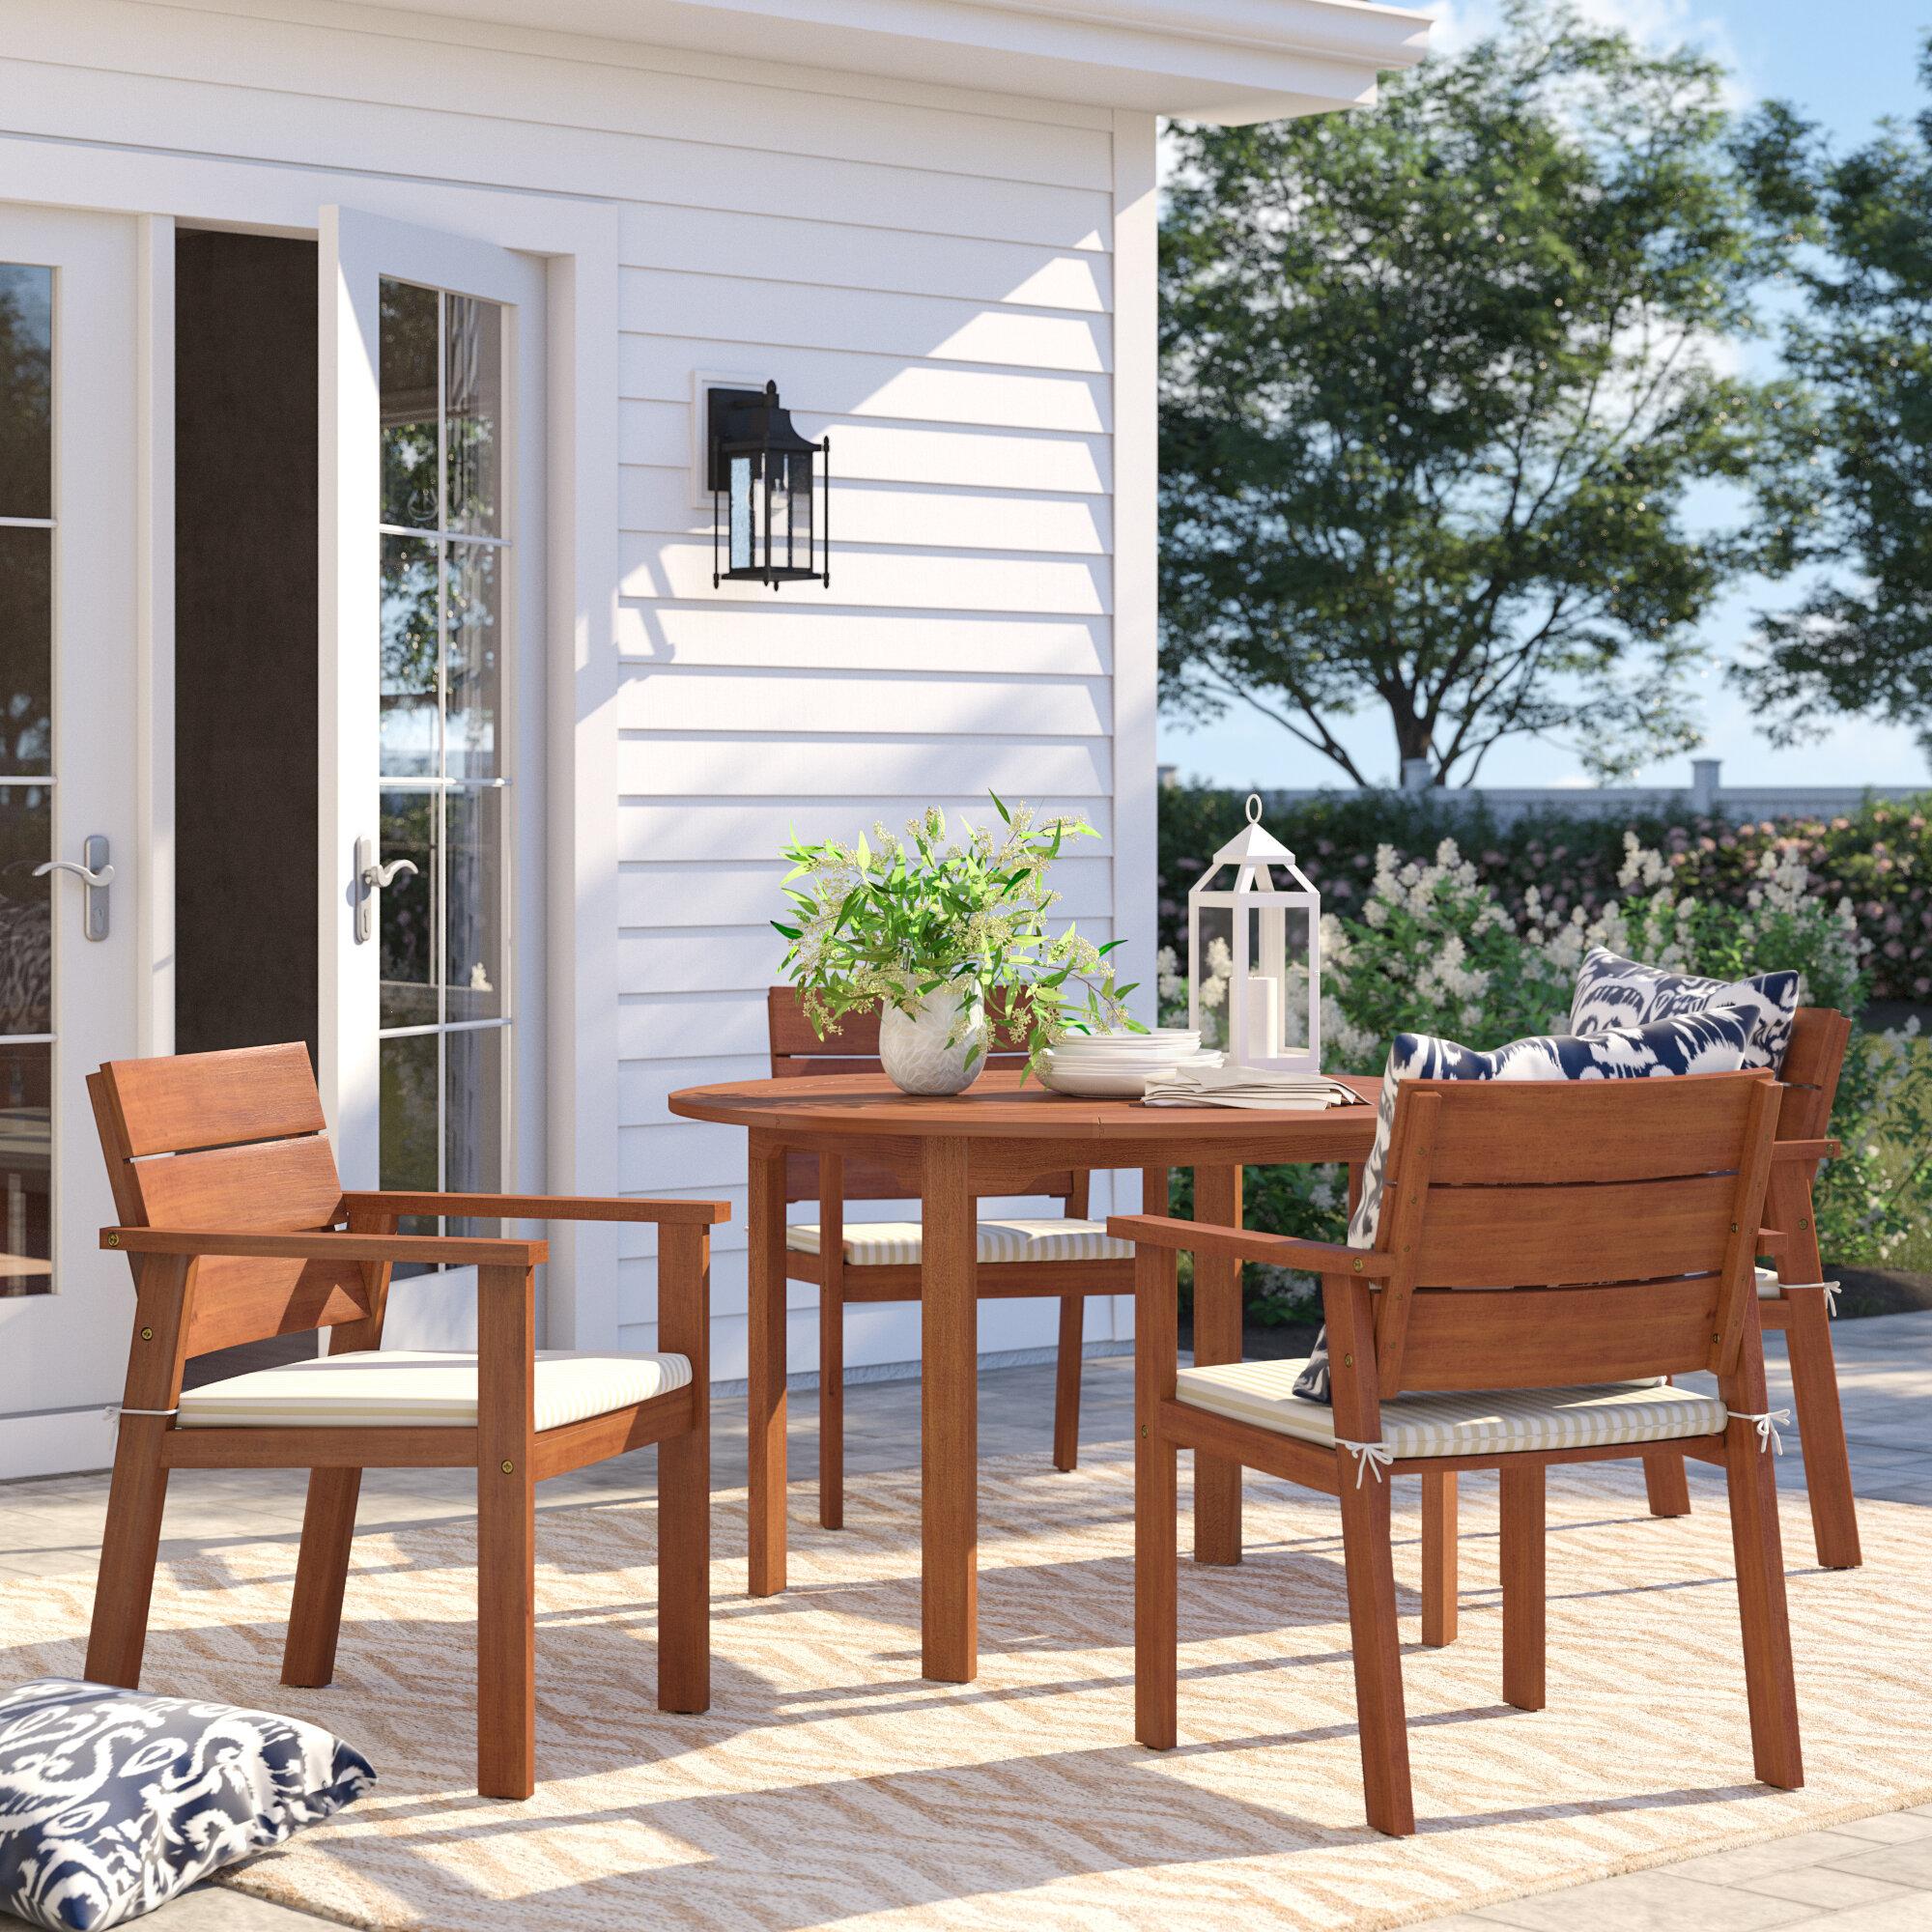 Sol 72 Outdoor Brighton 5 Piece Eucalyptus Dining Set With Cushions Reviews Wayfair